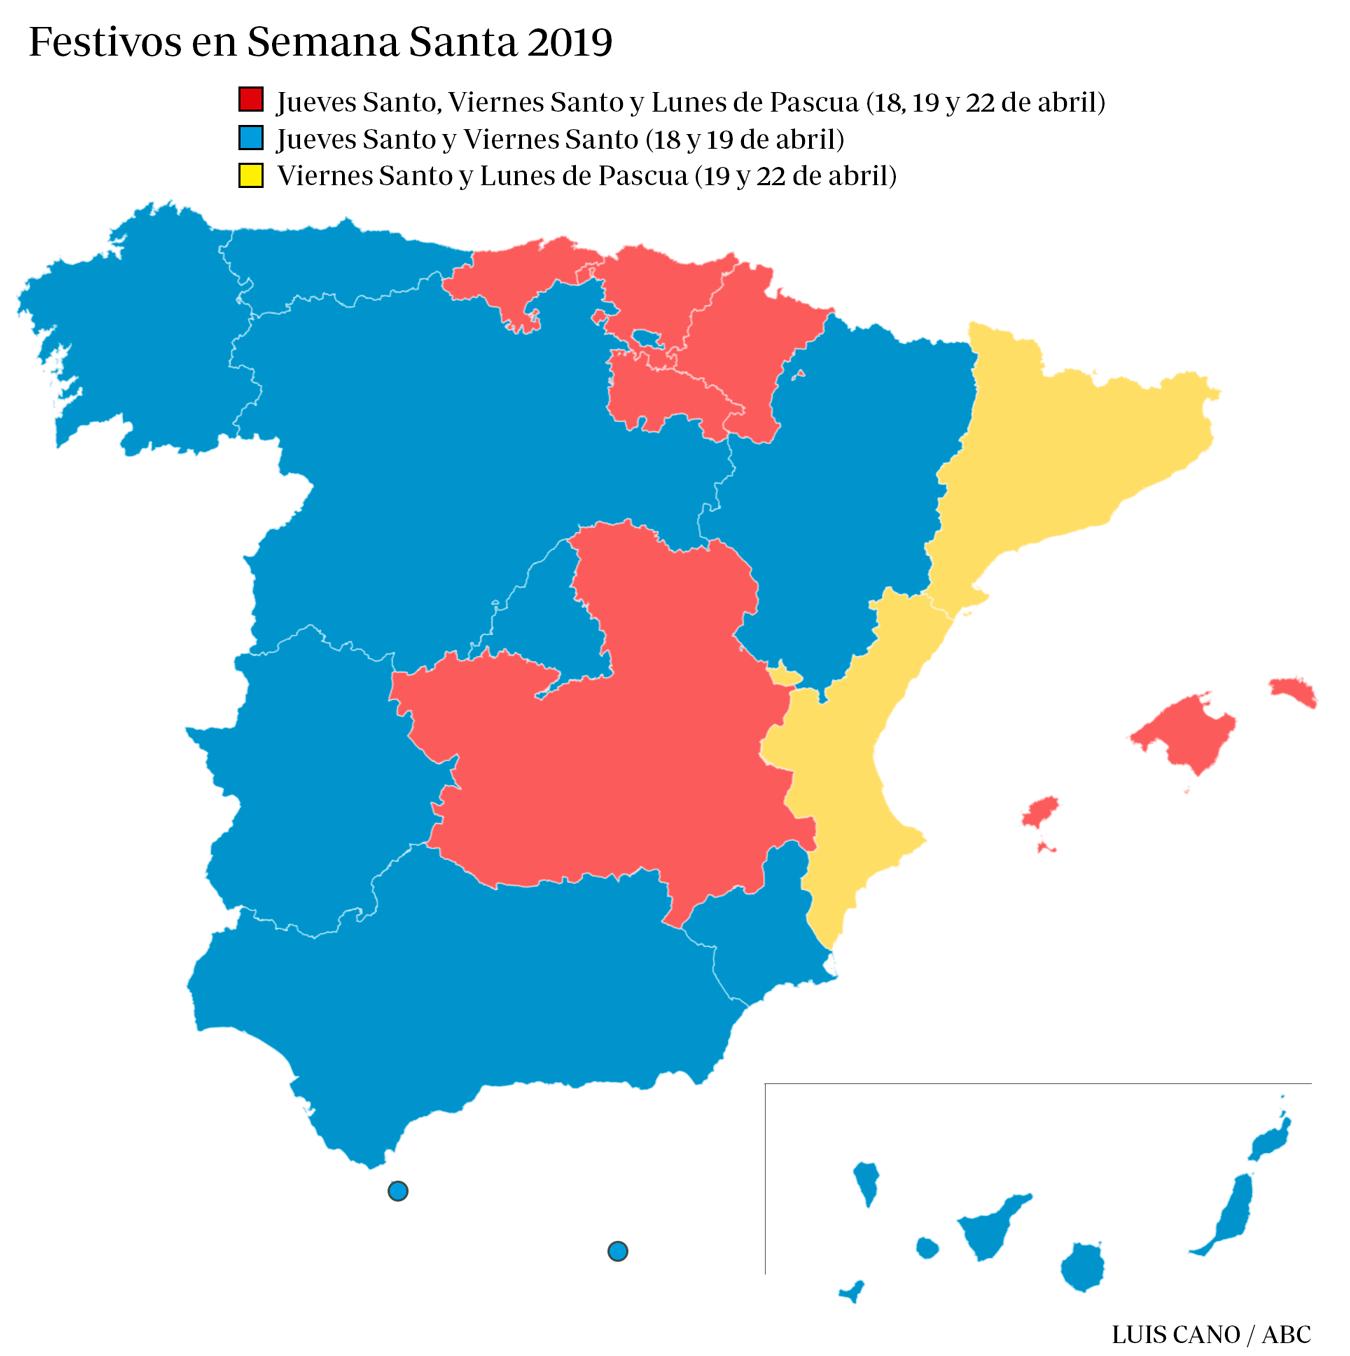 Festivos Semana Santa 2019